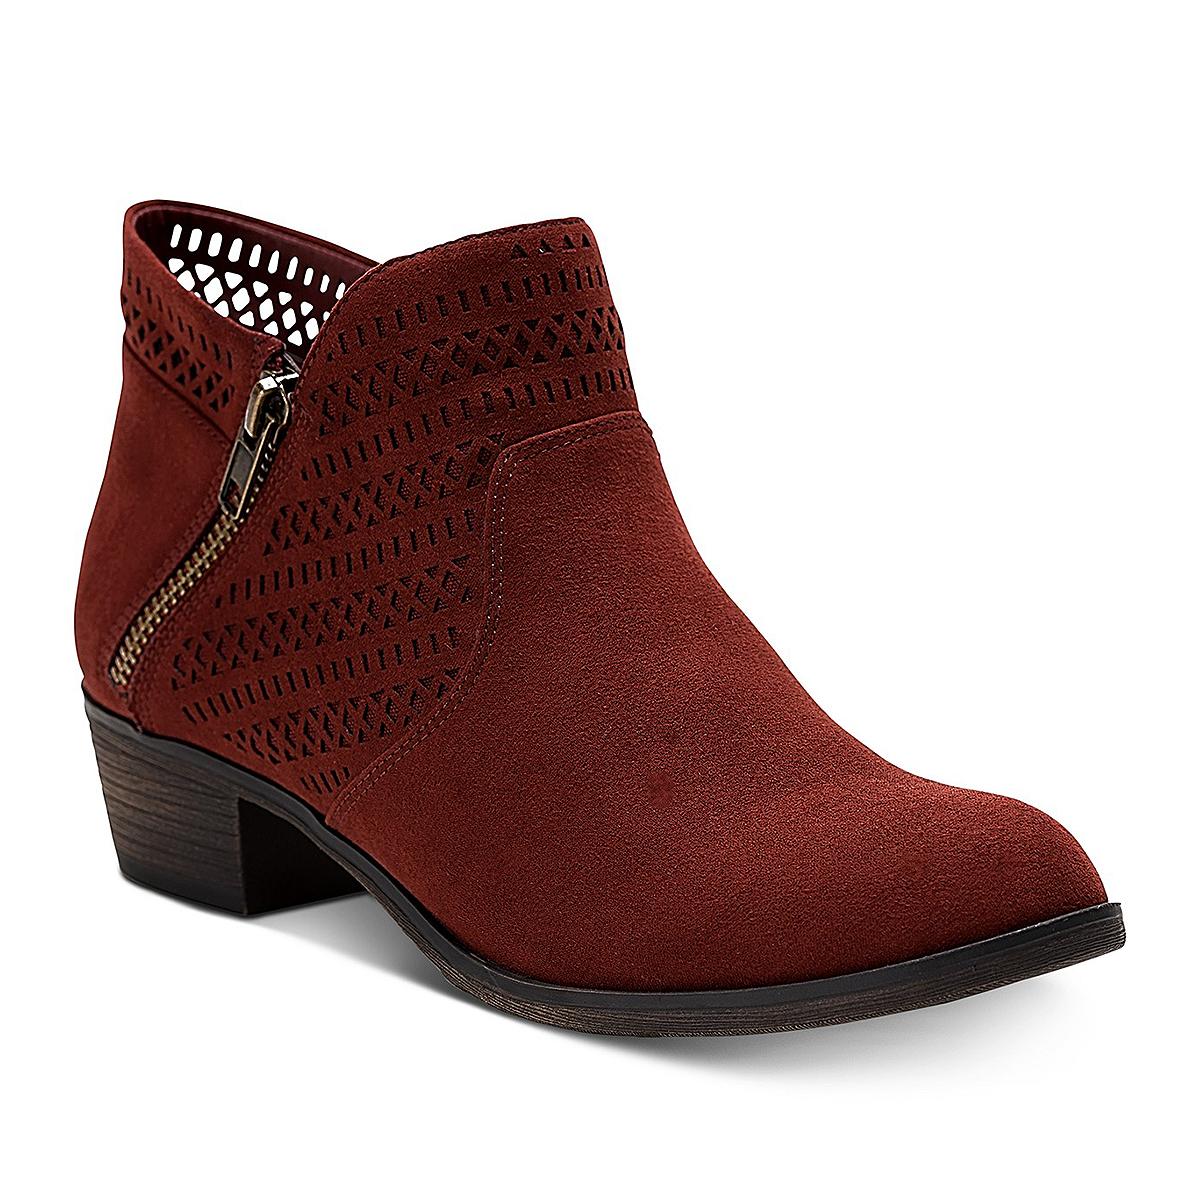 American Rag Abby boot